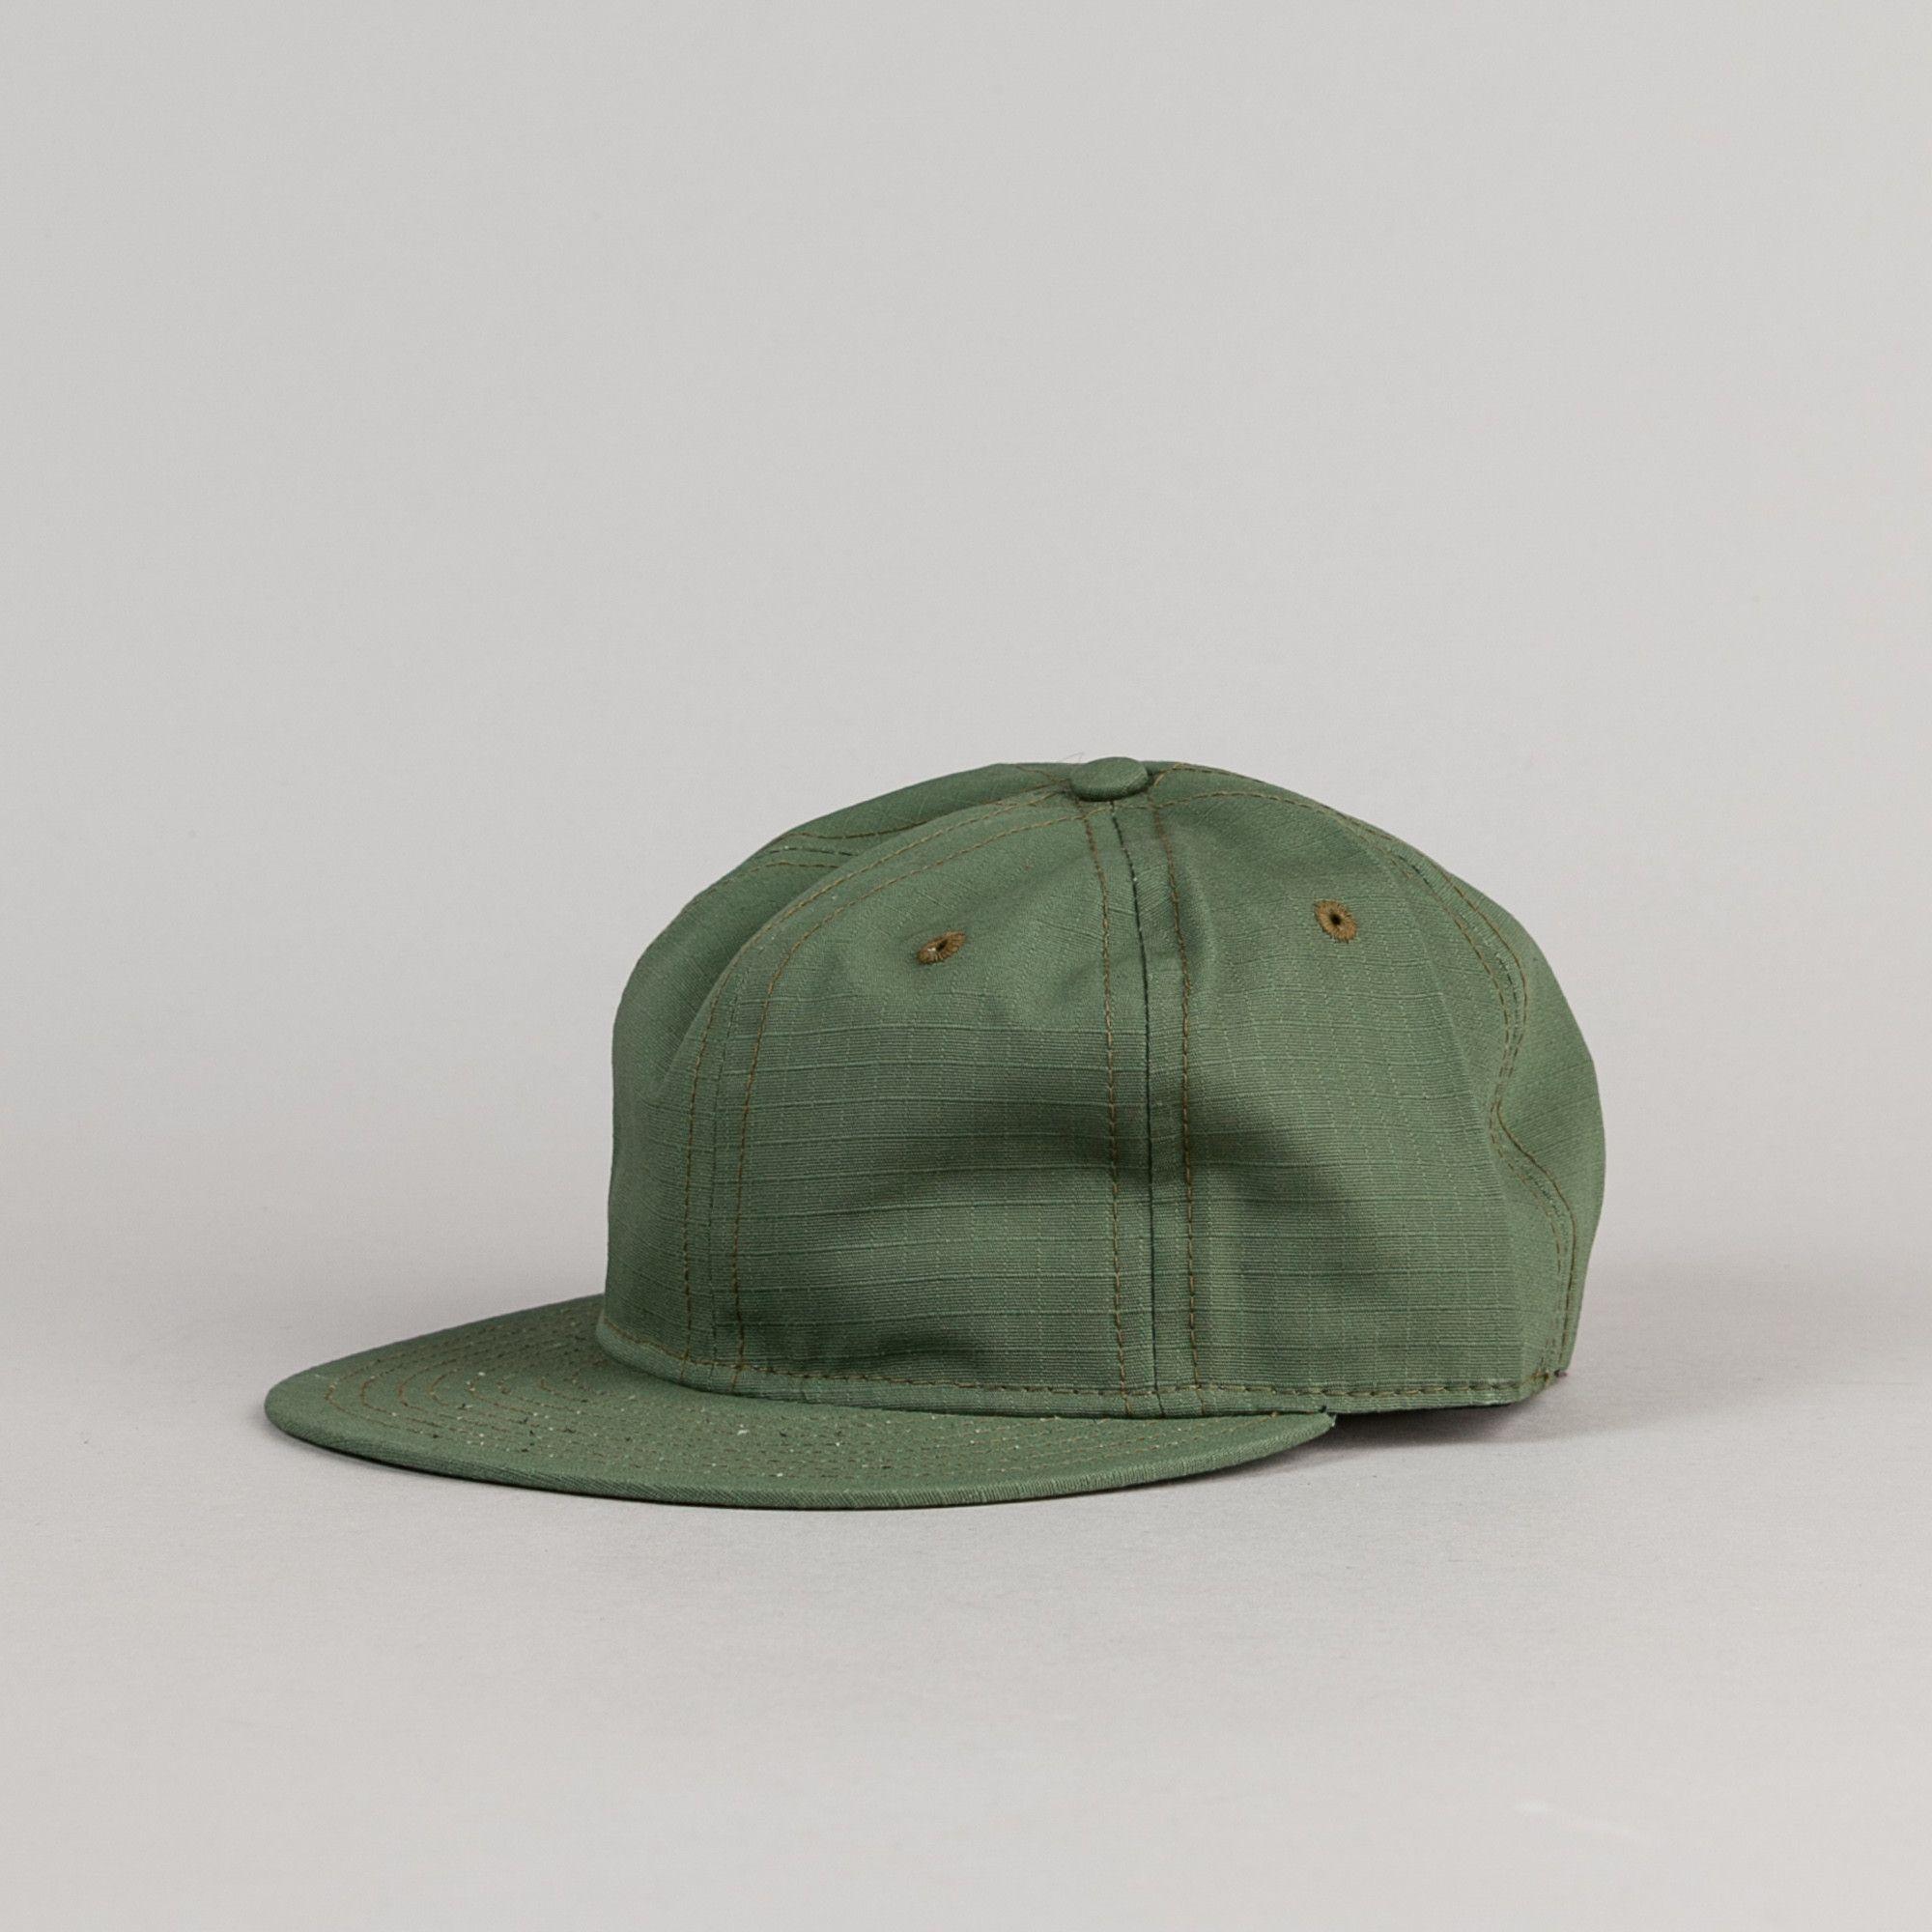 f18cda64f Ebbets Field Flannels Rip-Stop Cap - Olive Drab | Headwear | Flannel ...